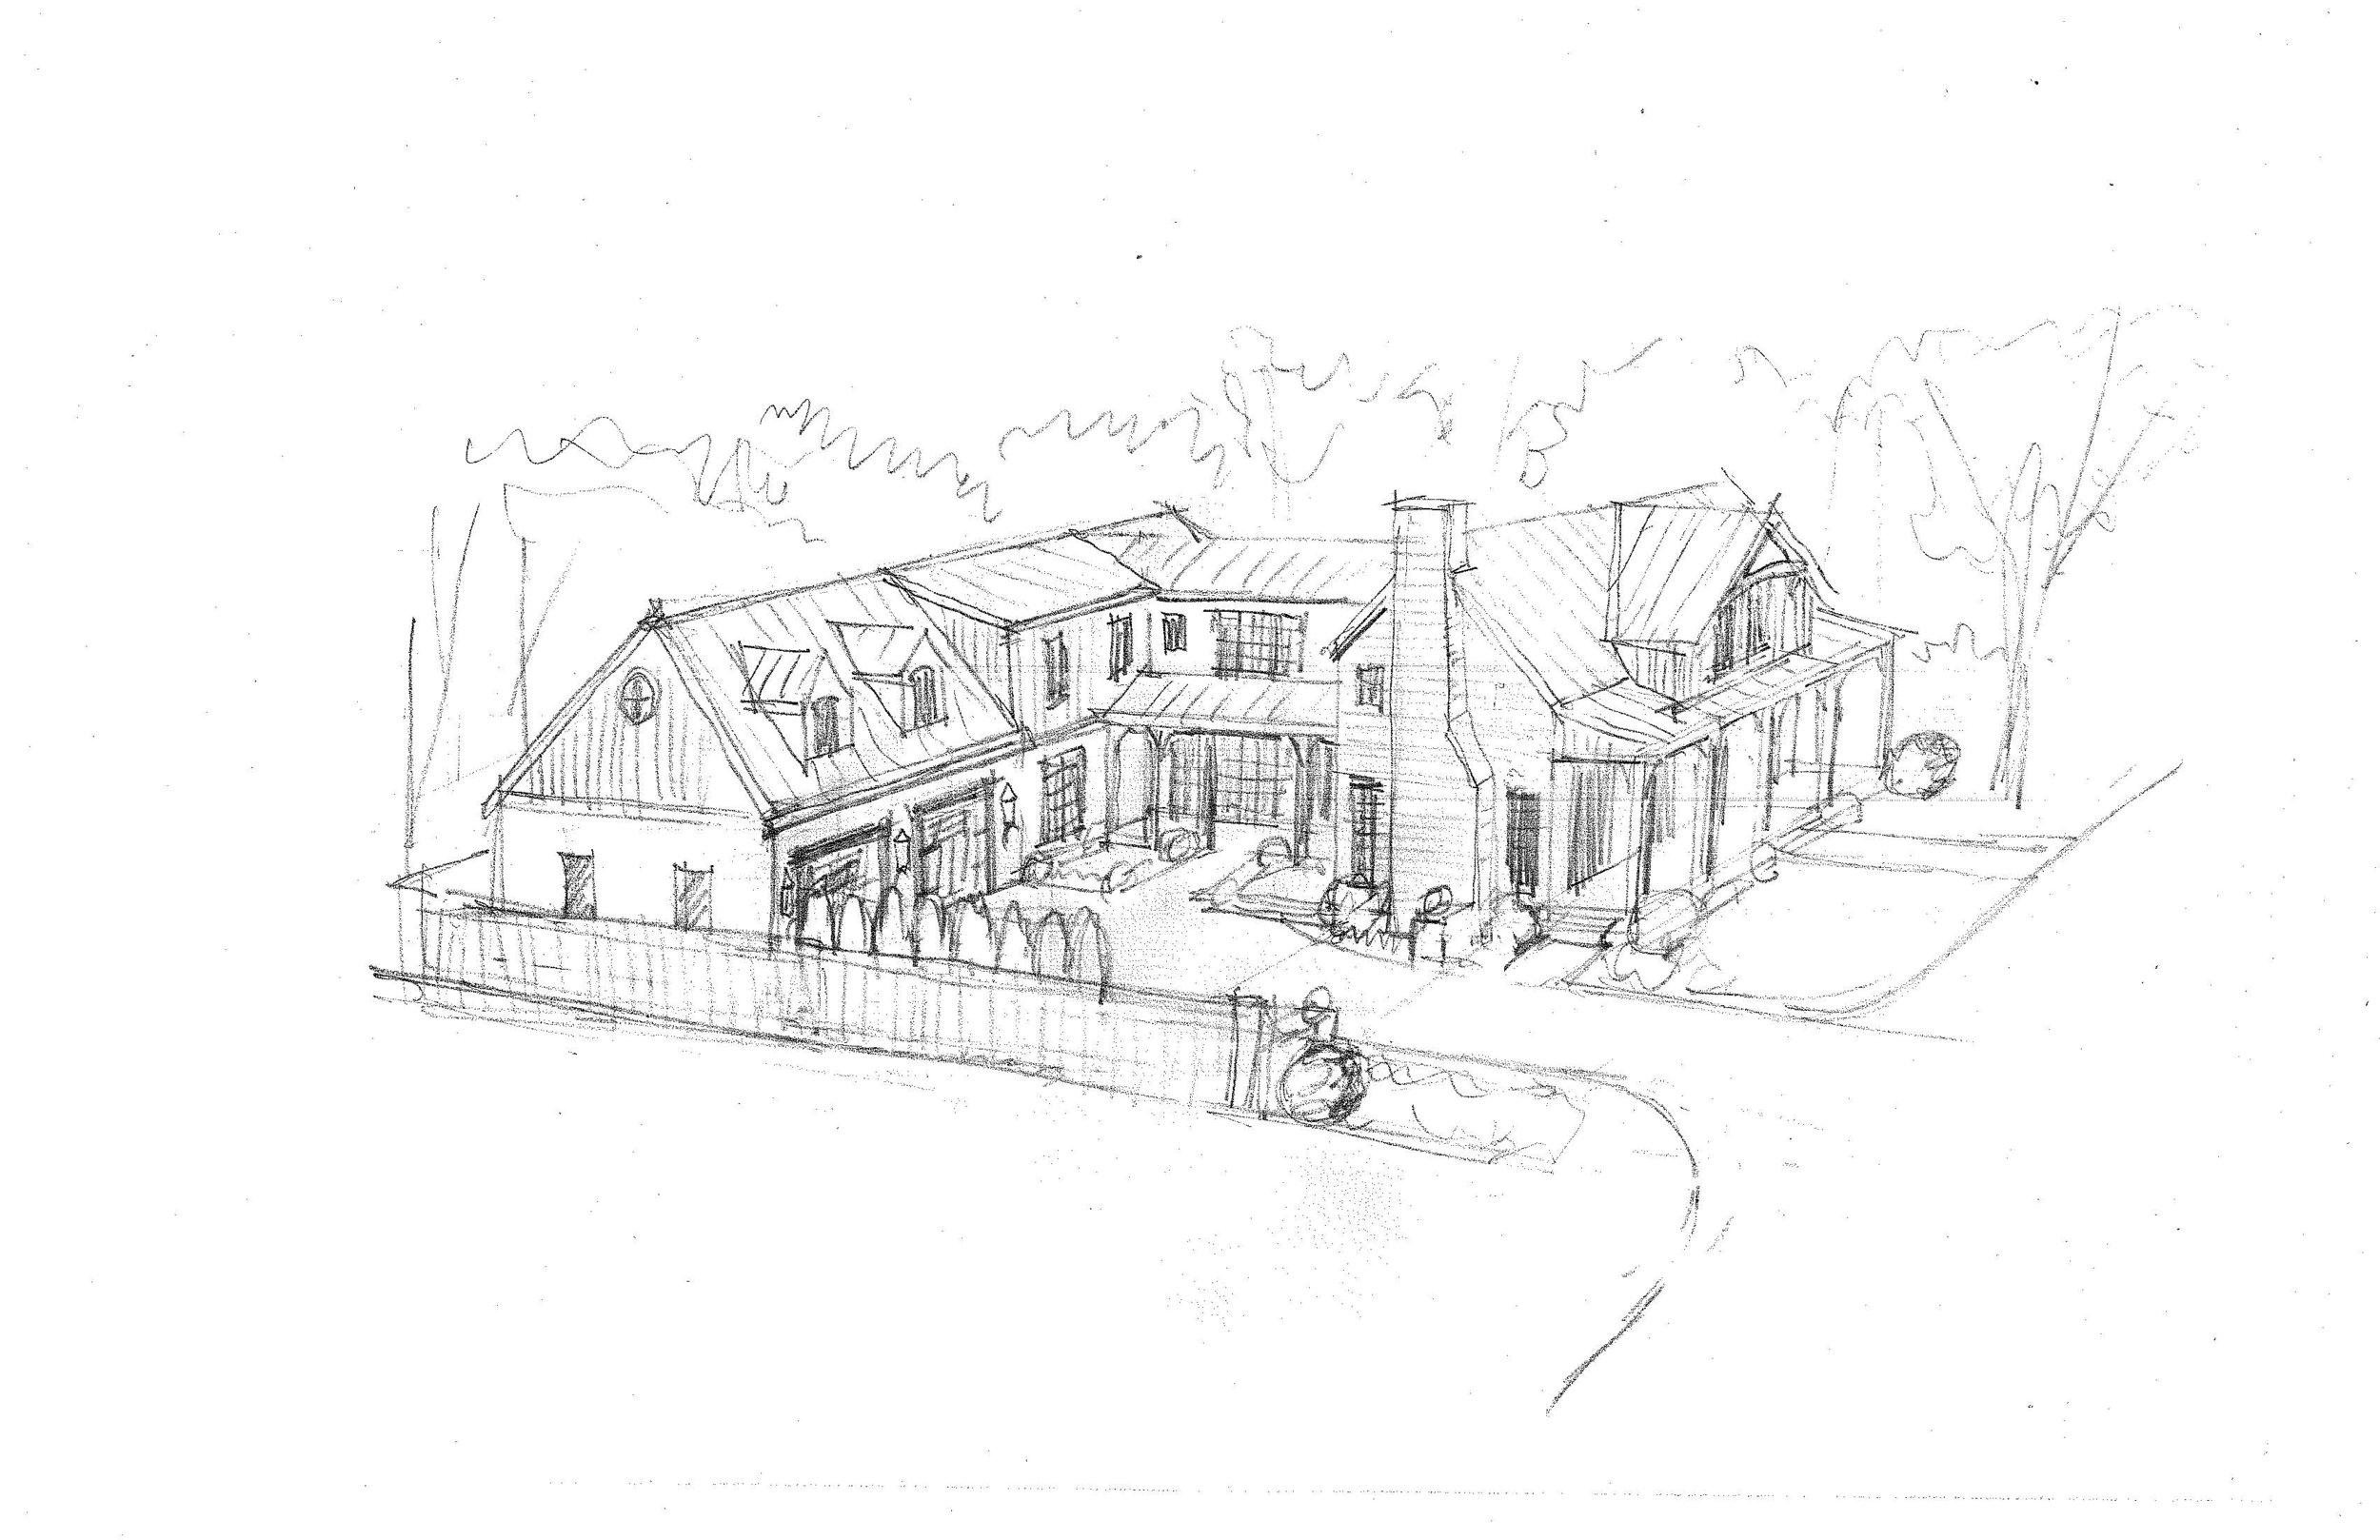 Minard Spec House Entire Plan - 3rd Plan_Page_6.jpg